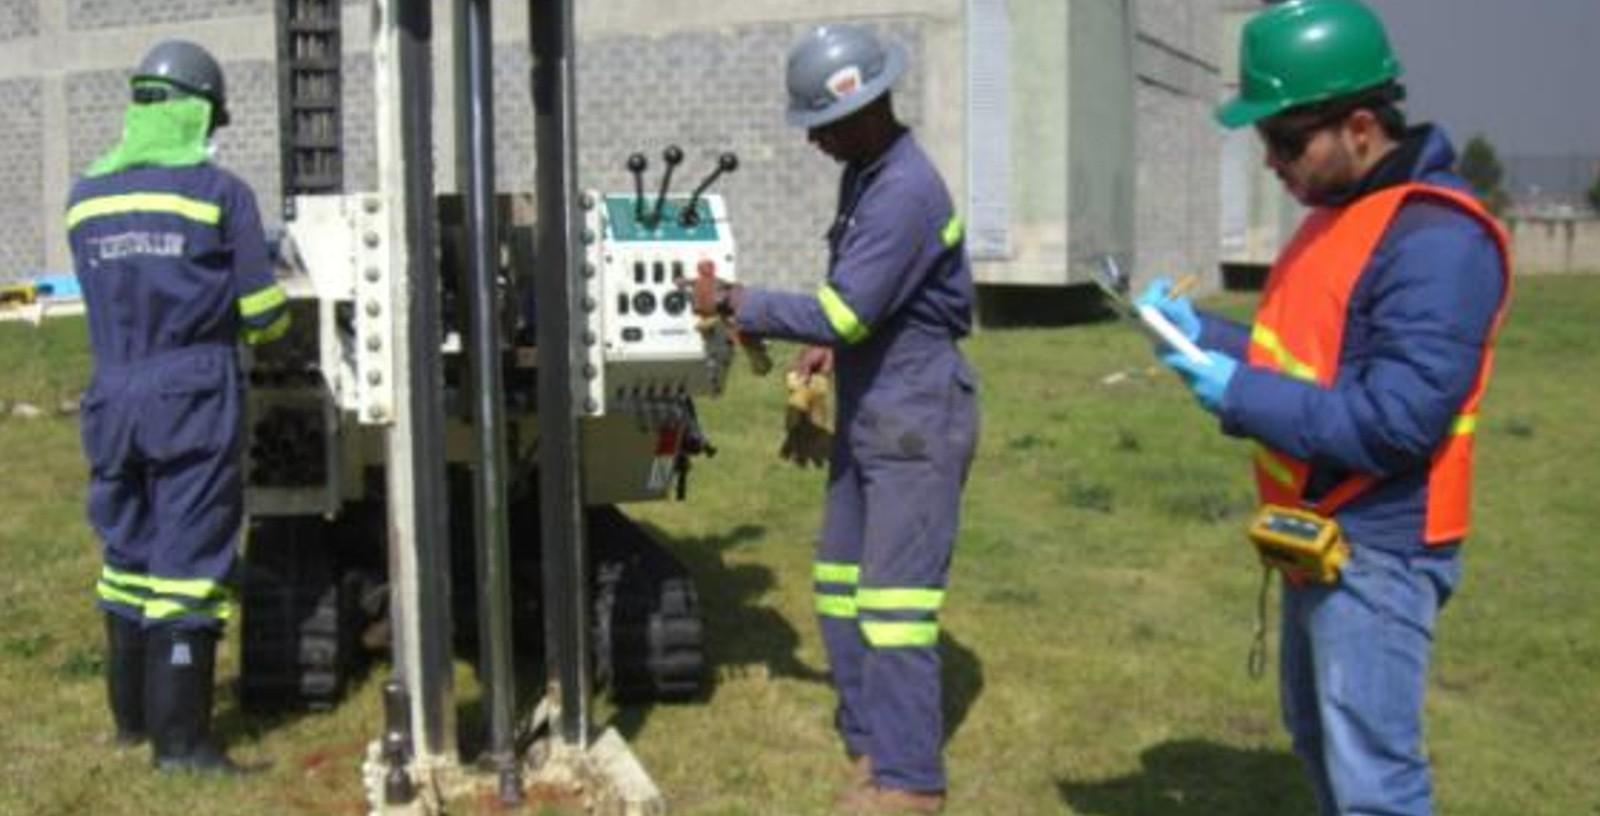 Environmental_DueDiligence_IyII_CFR_BASAN_Ministerio_Defensa_Nacional_Colombia_IDOM_2